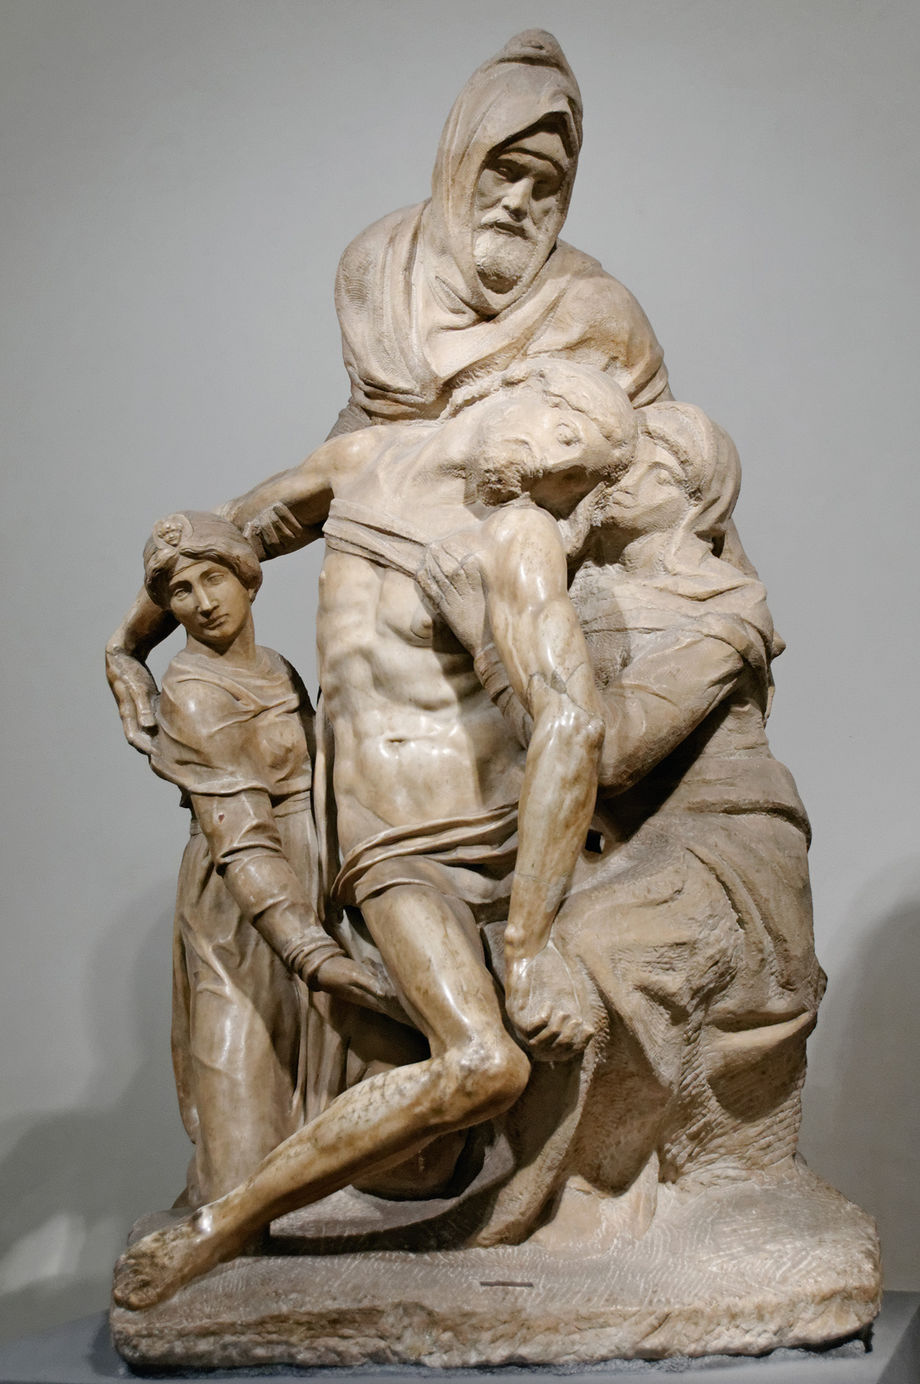 Микеланджело и его нон-финито